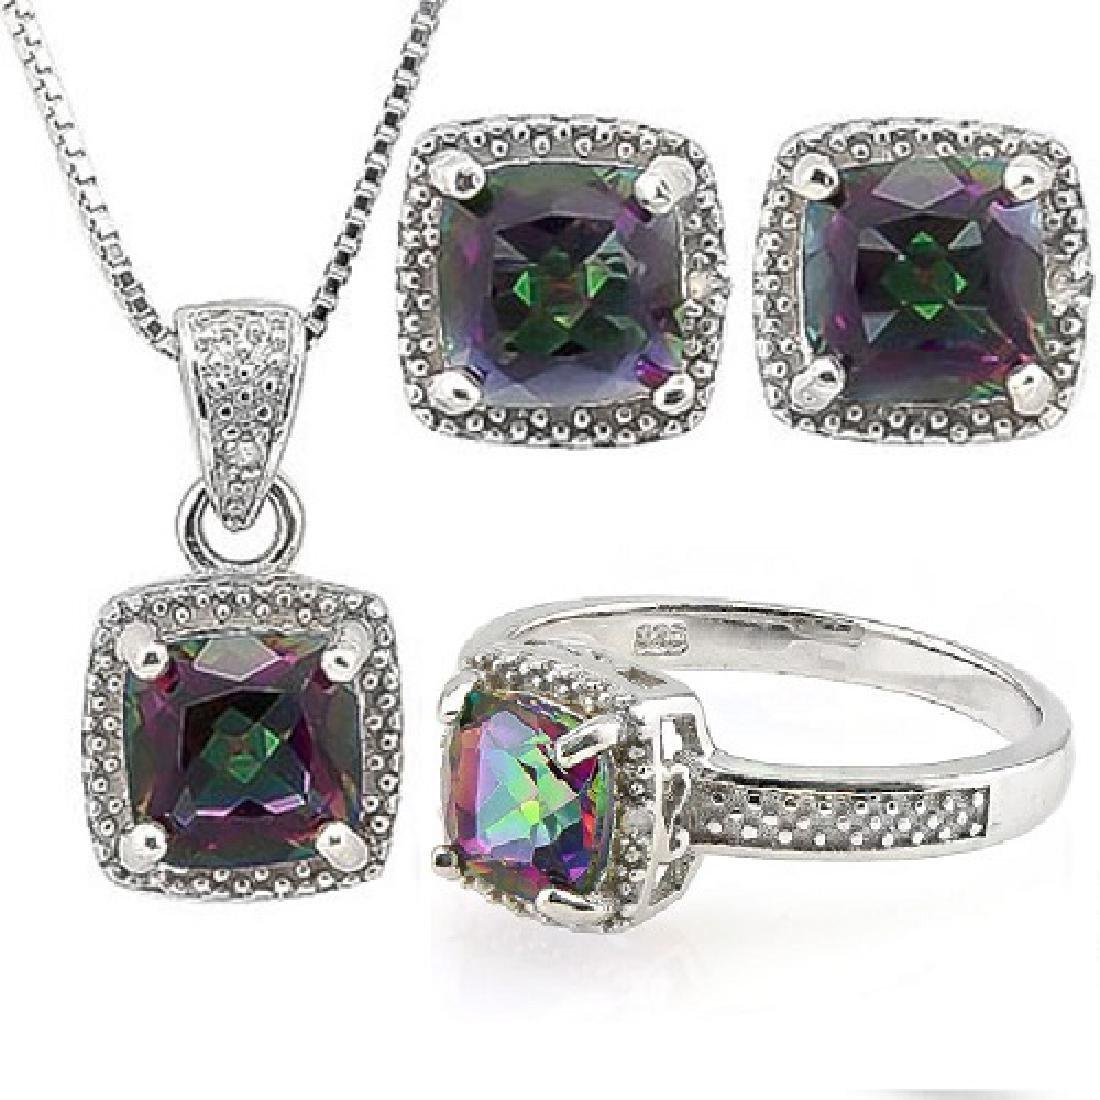 4 CARAT MYSTIC GEMSTONE & DIAMOND 925 STERLING SILVER S